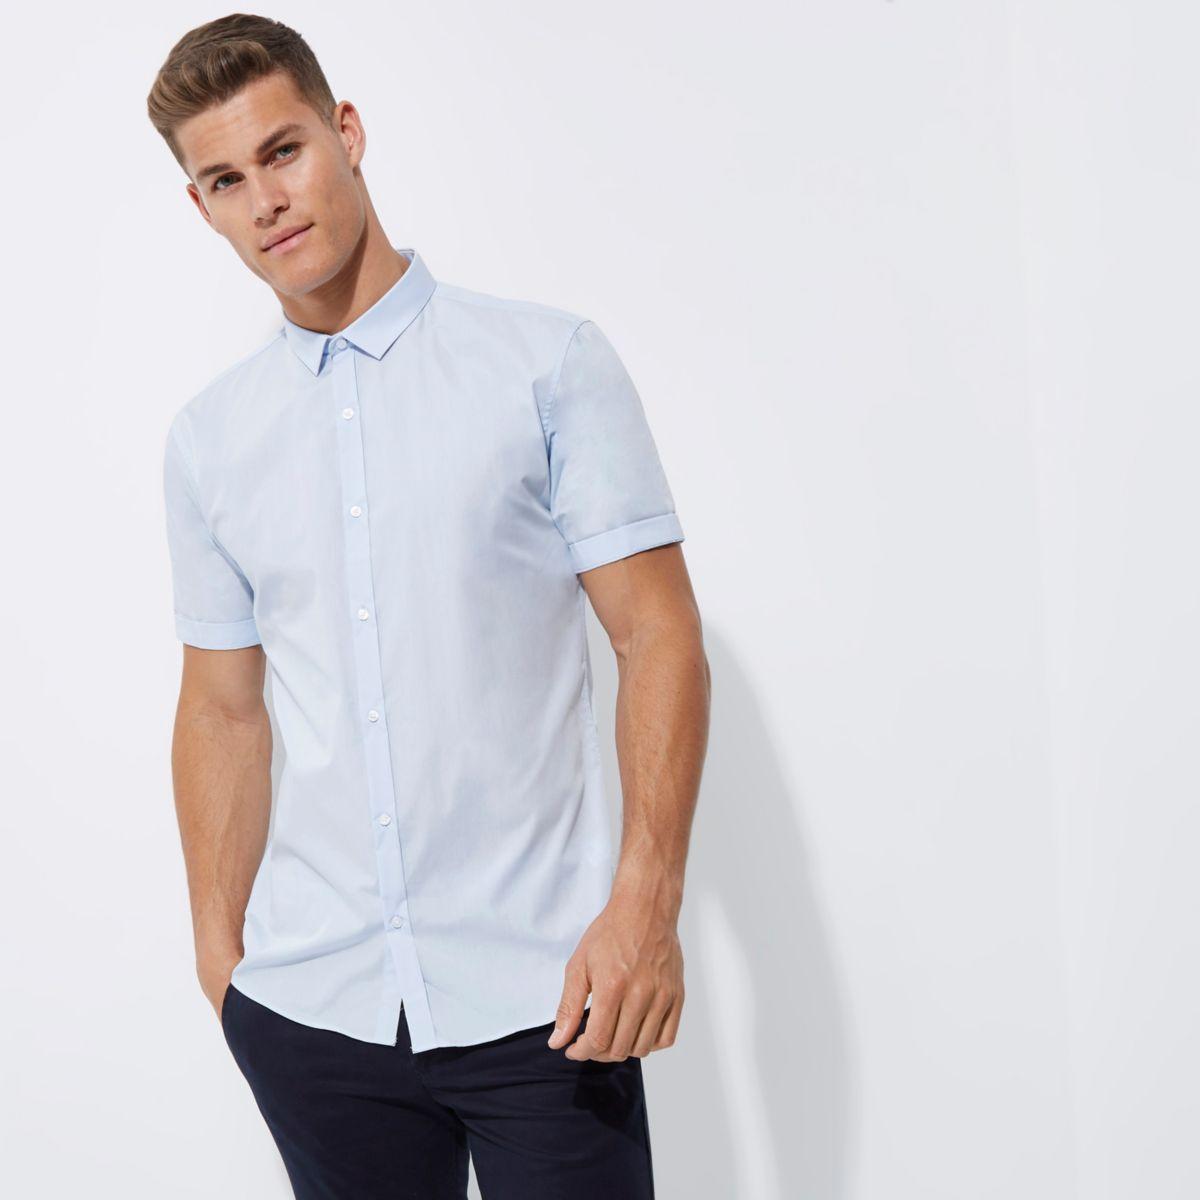 Blaures, kurzärmliges Slim Fit Hemd